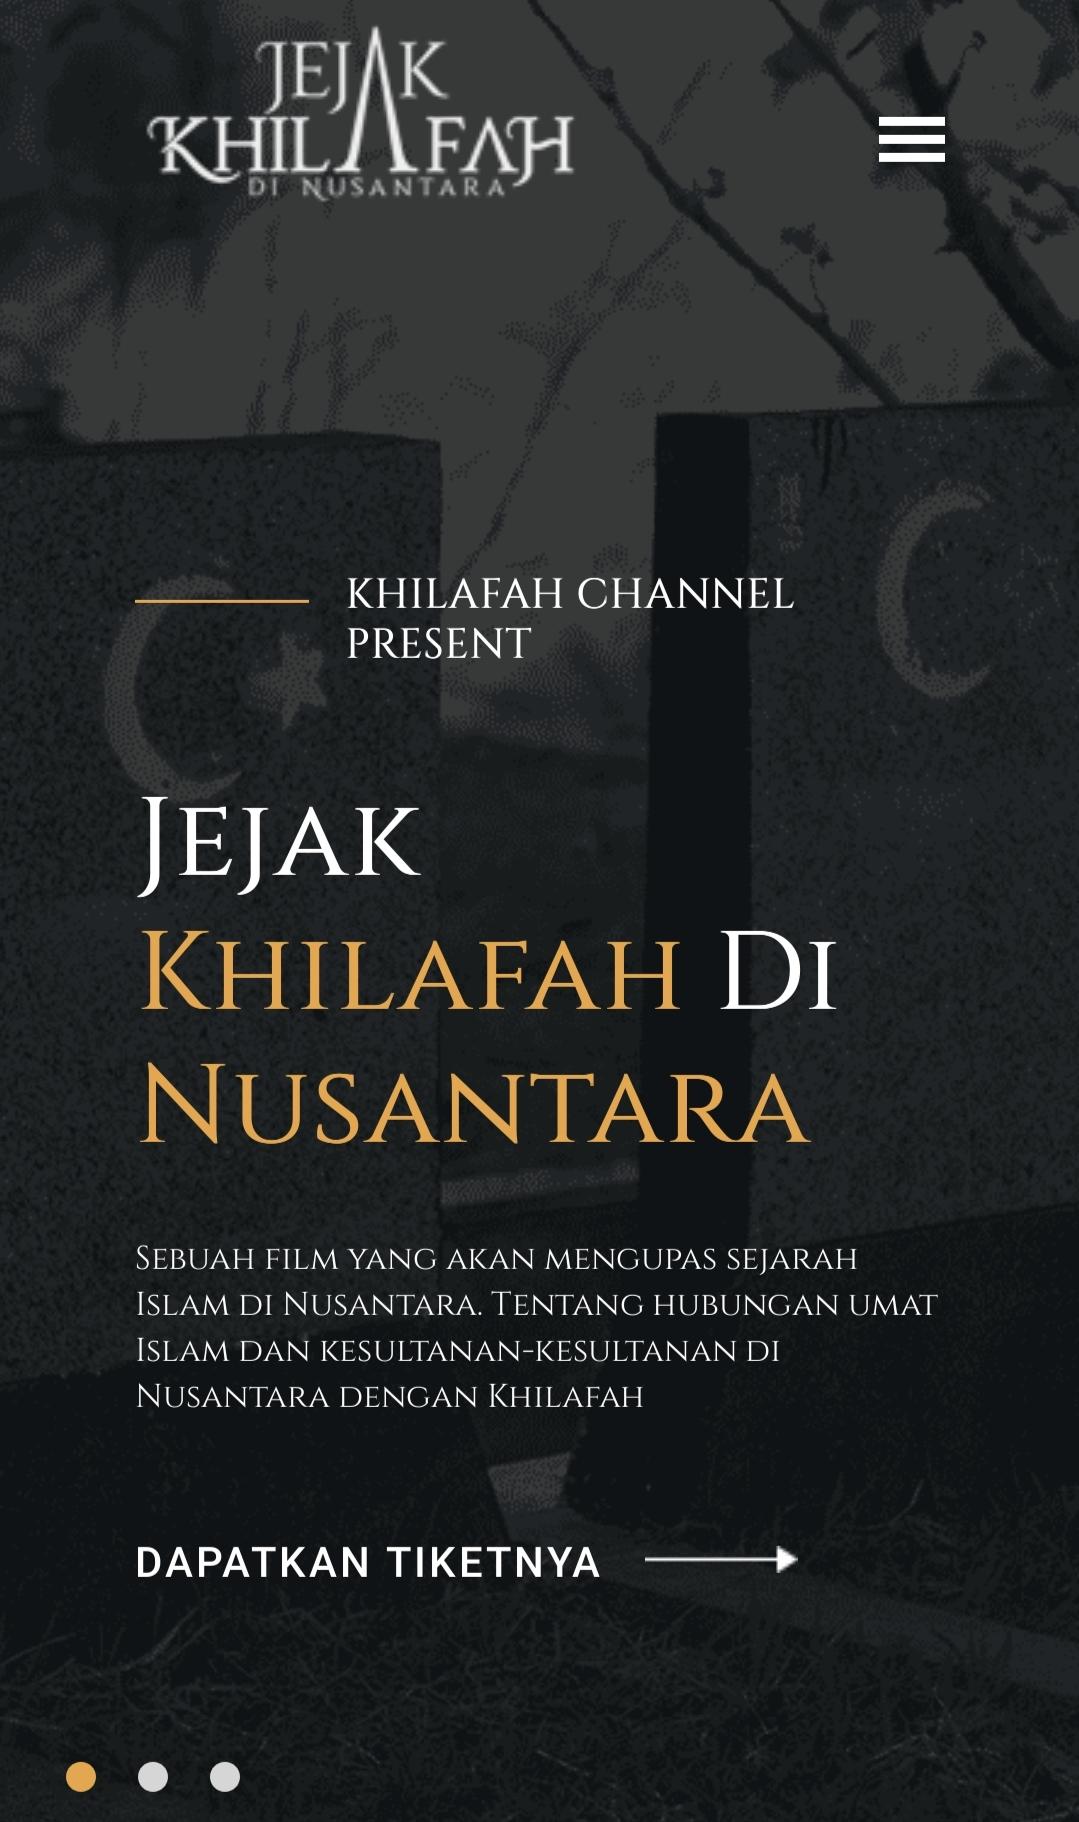 PREMIER PERDANA FILM DOKUMENTER PERTAMA DI INDONESIA